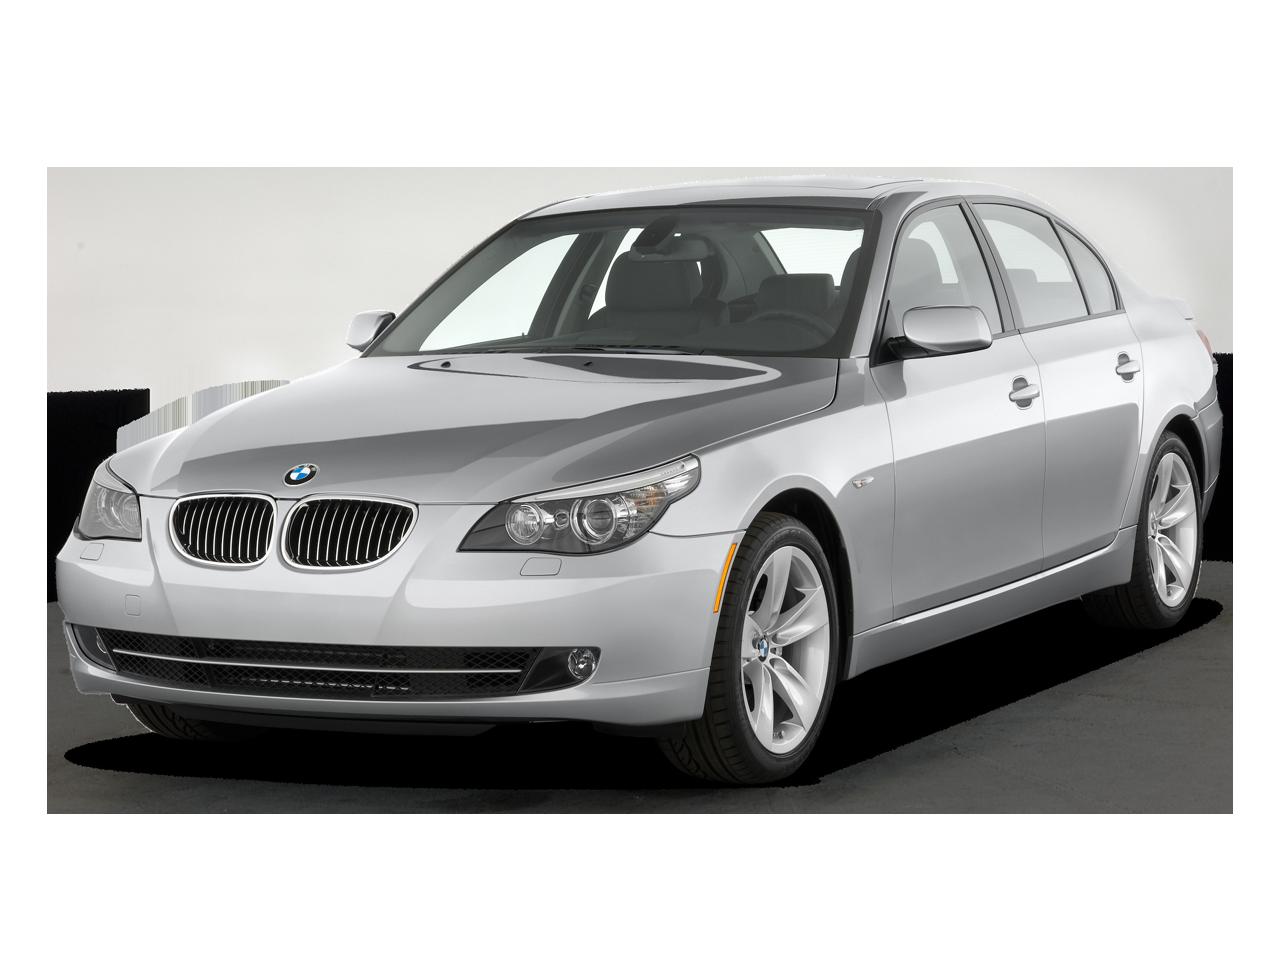 2009 bmw 535i sedan bmw luxury sedan review automobile. Black Bedroom Furniture Sets. Home Design Ideas